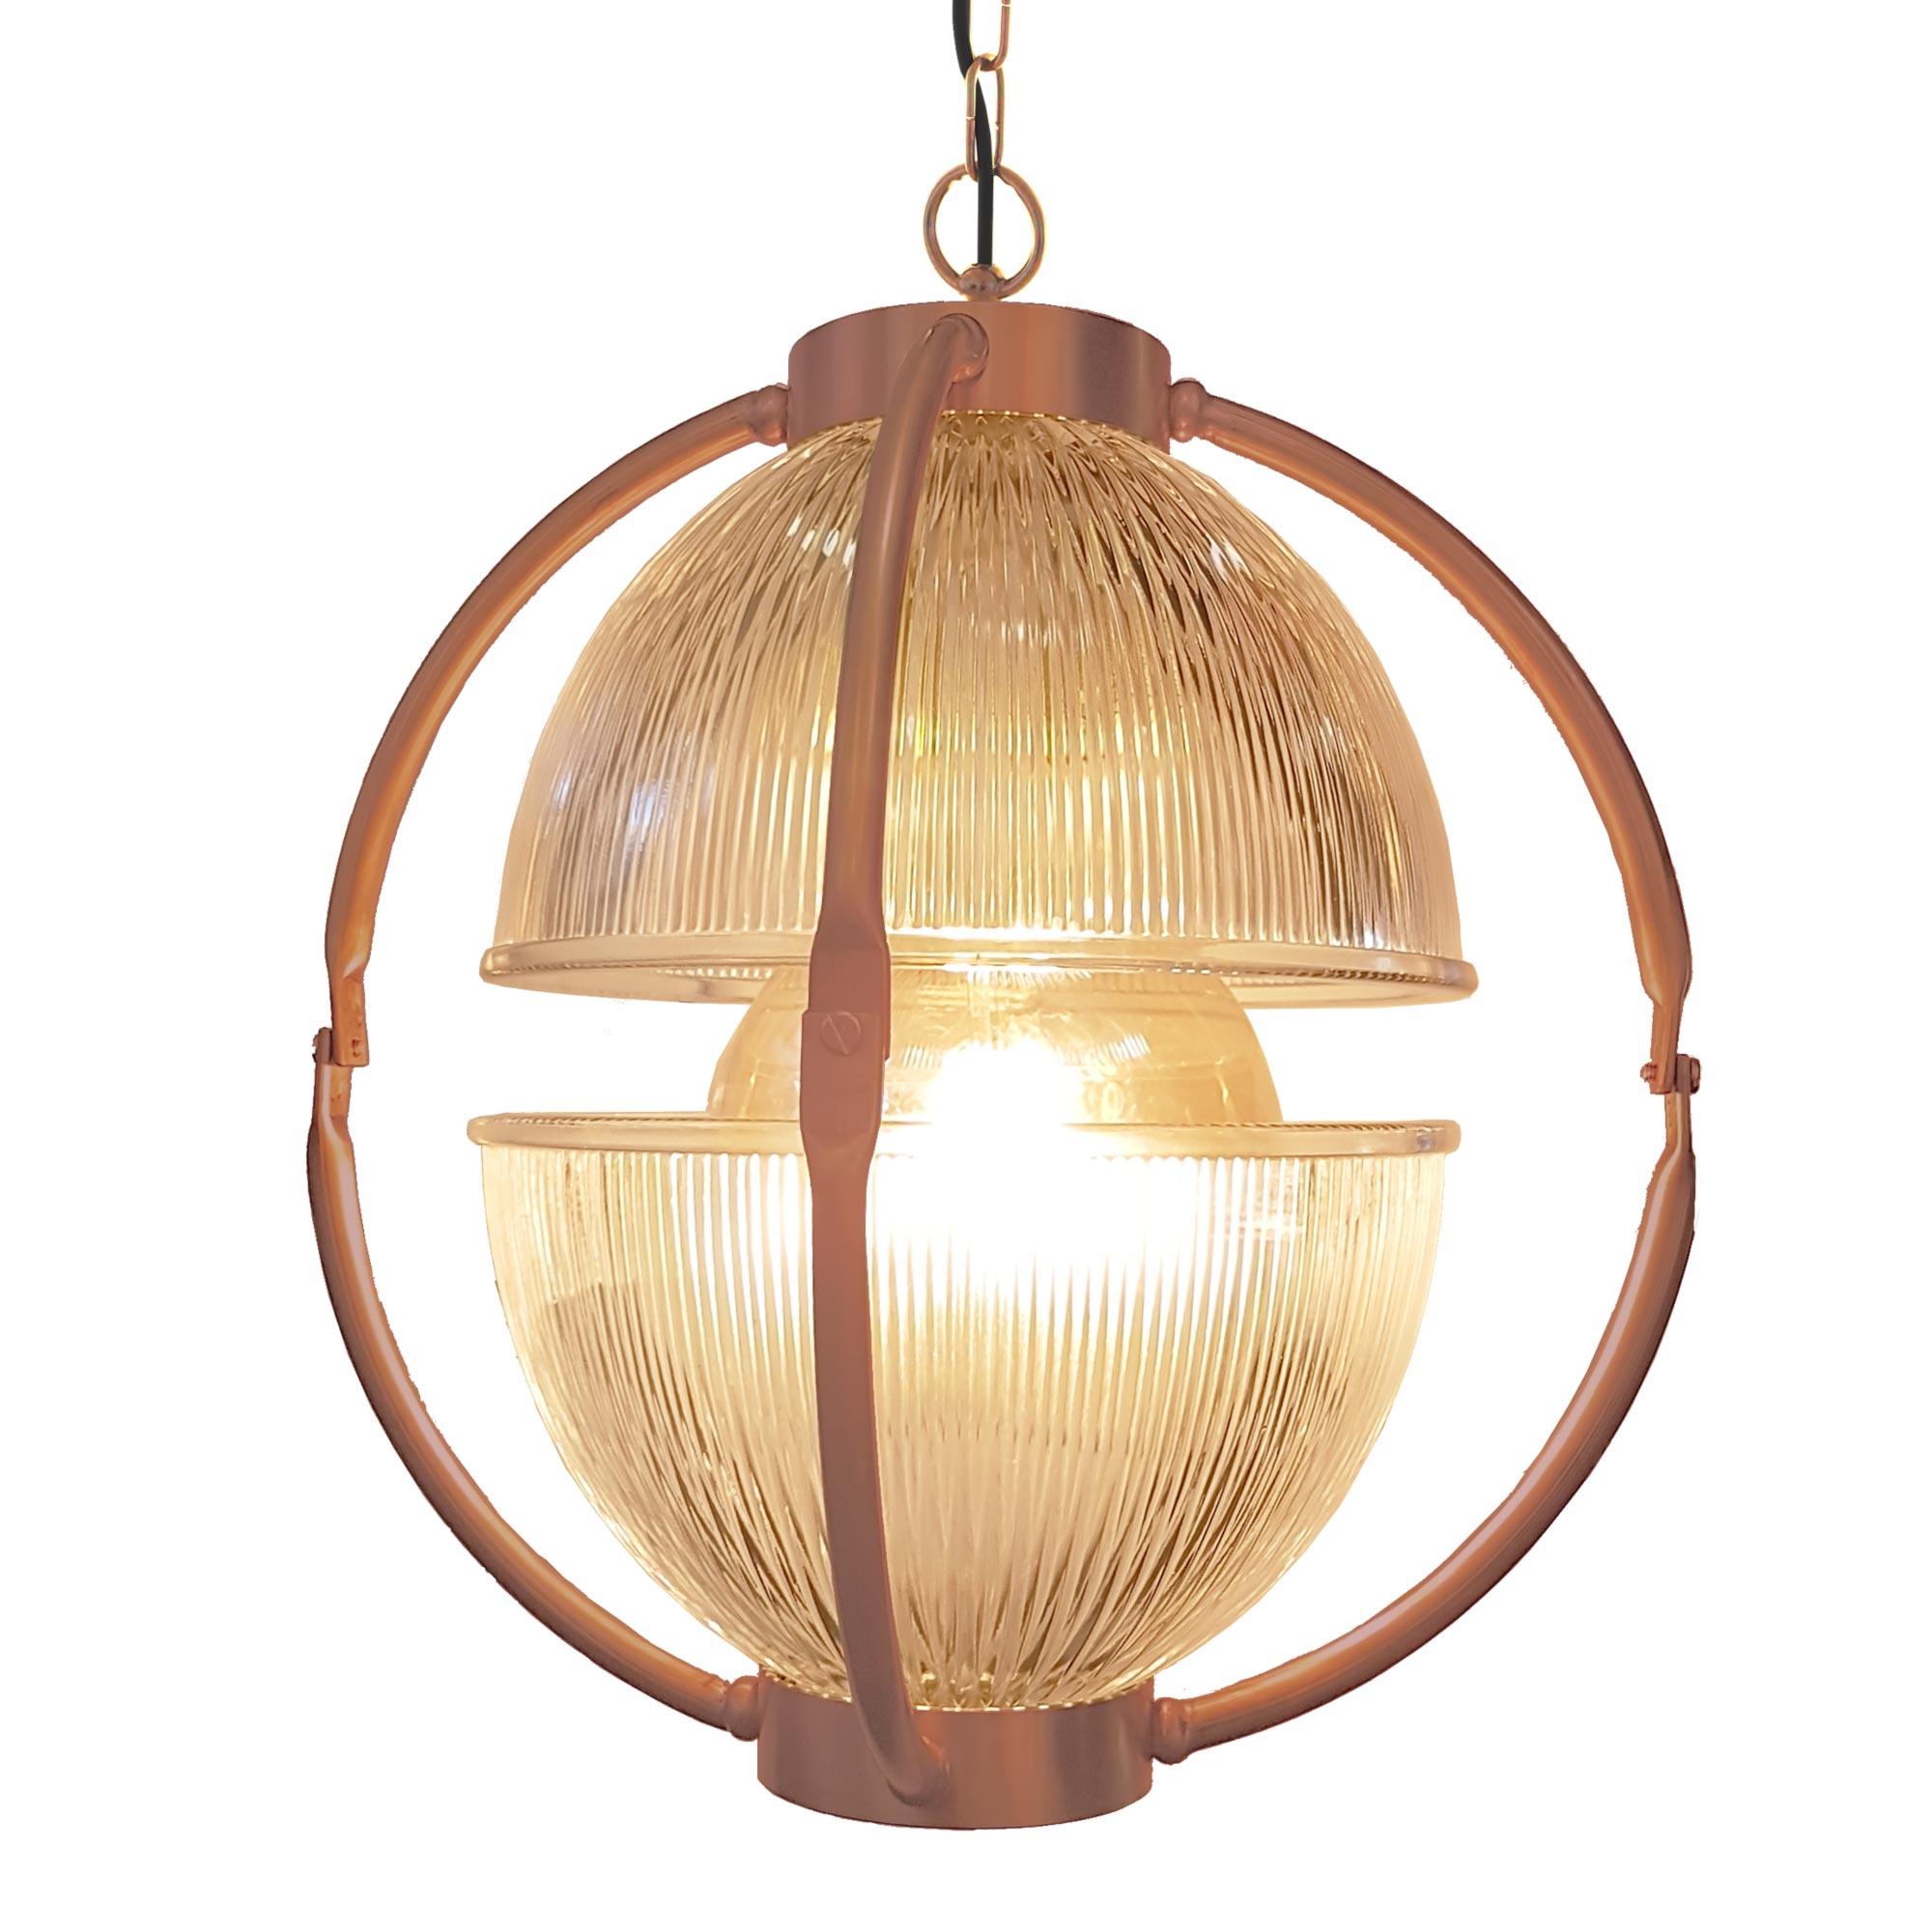 Matt Copper Glass Orb Pendant Light | E2 Contract Lighting ...